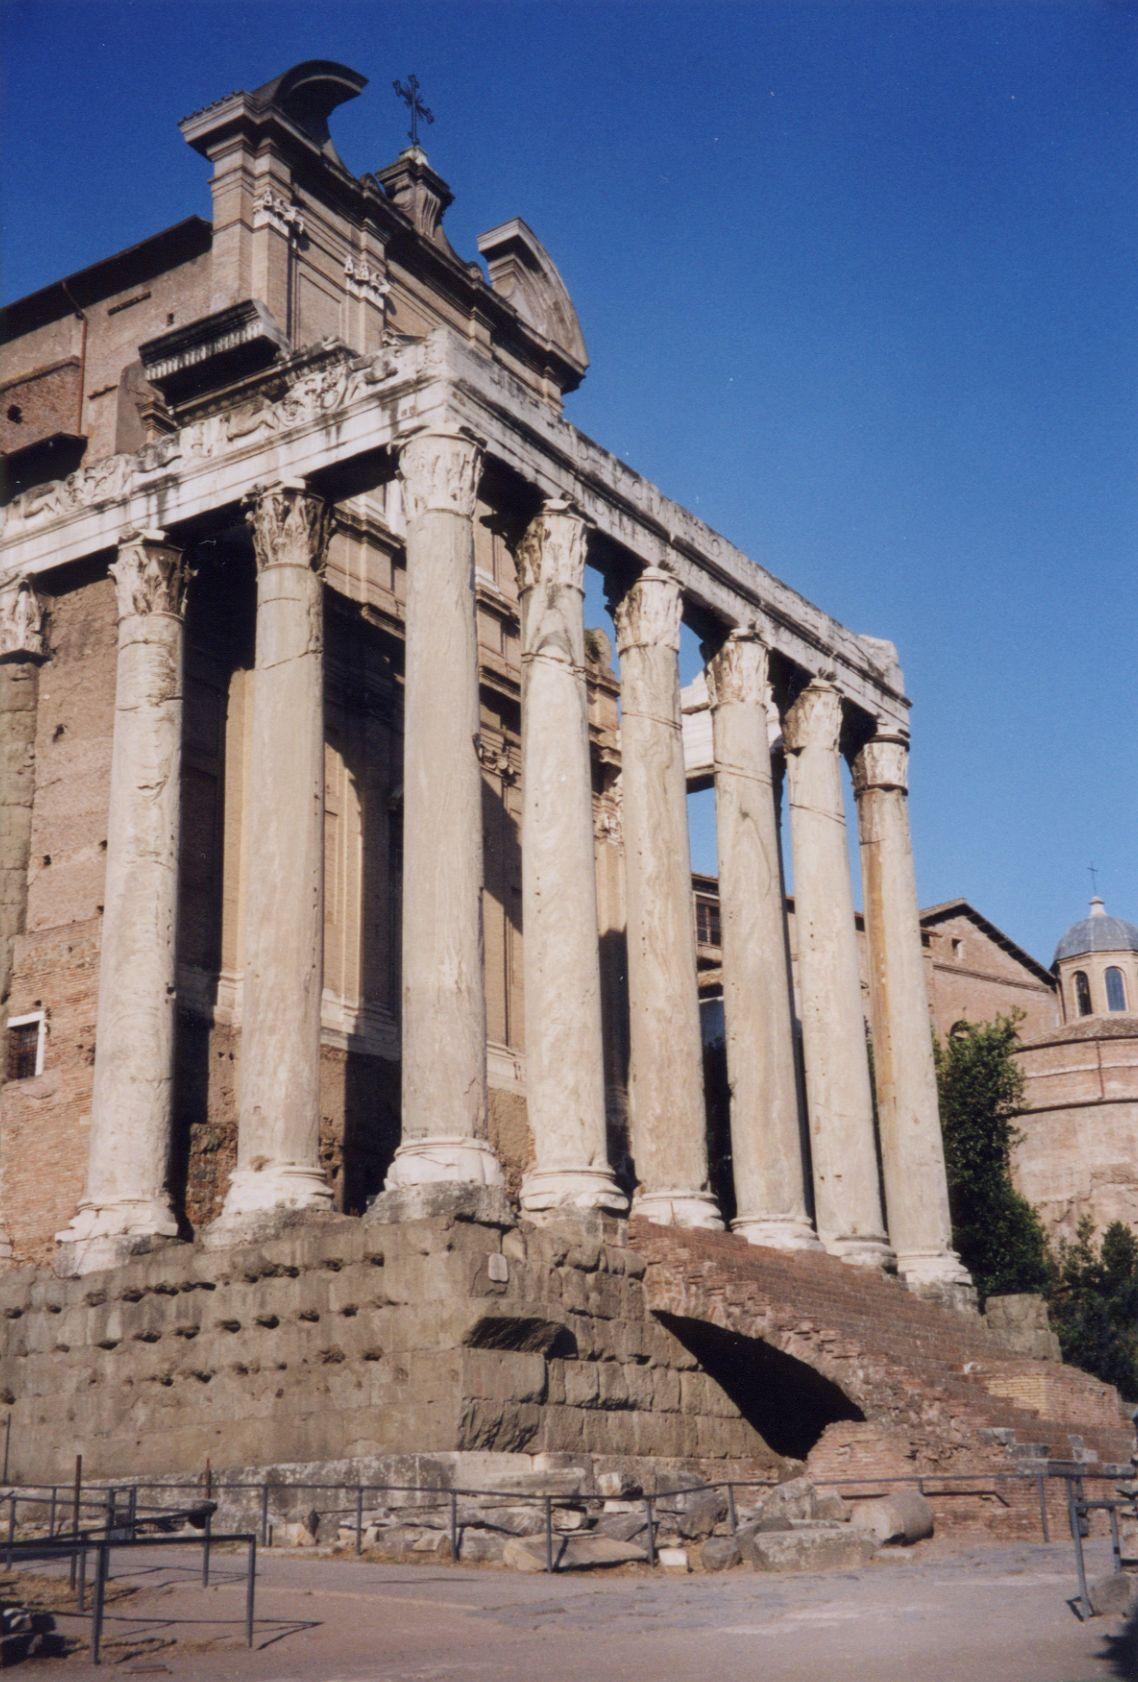 greek columns corinthian old ruin stone ruins monument relic greece greecian image